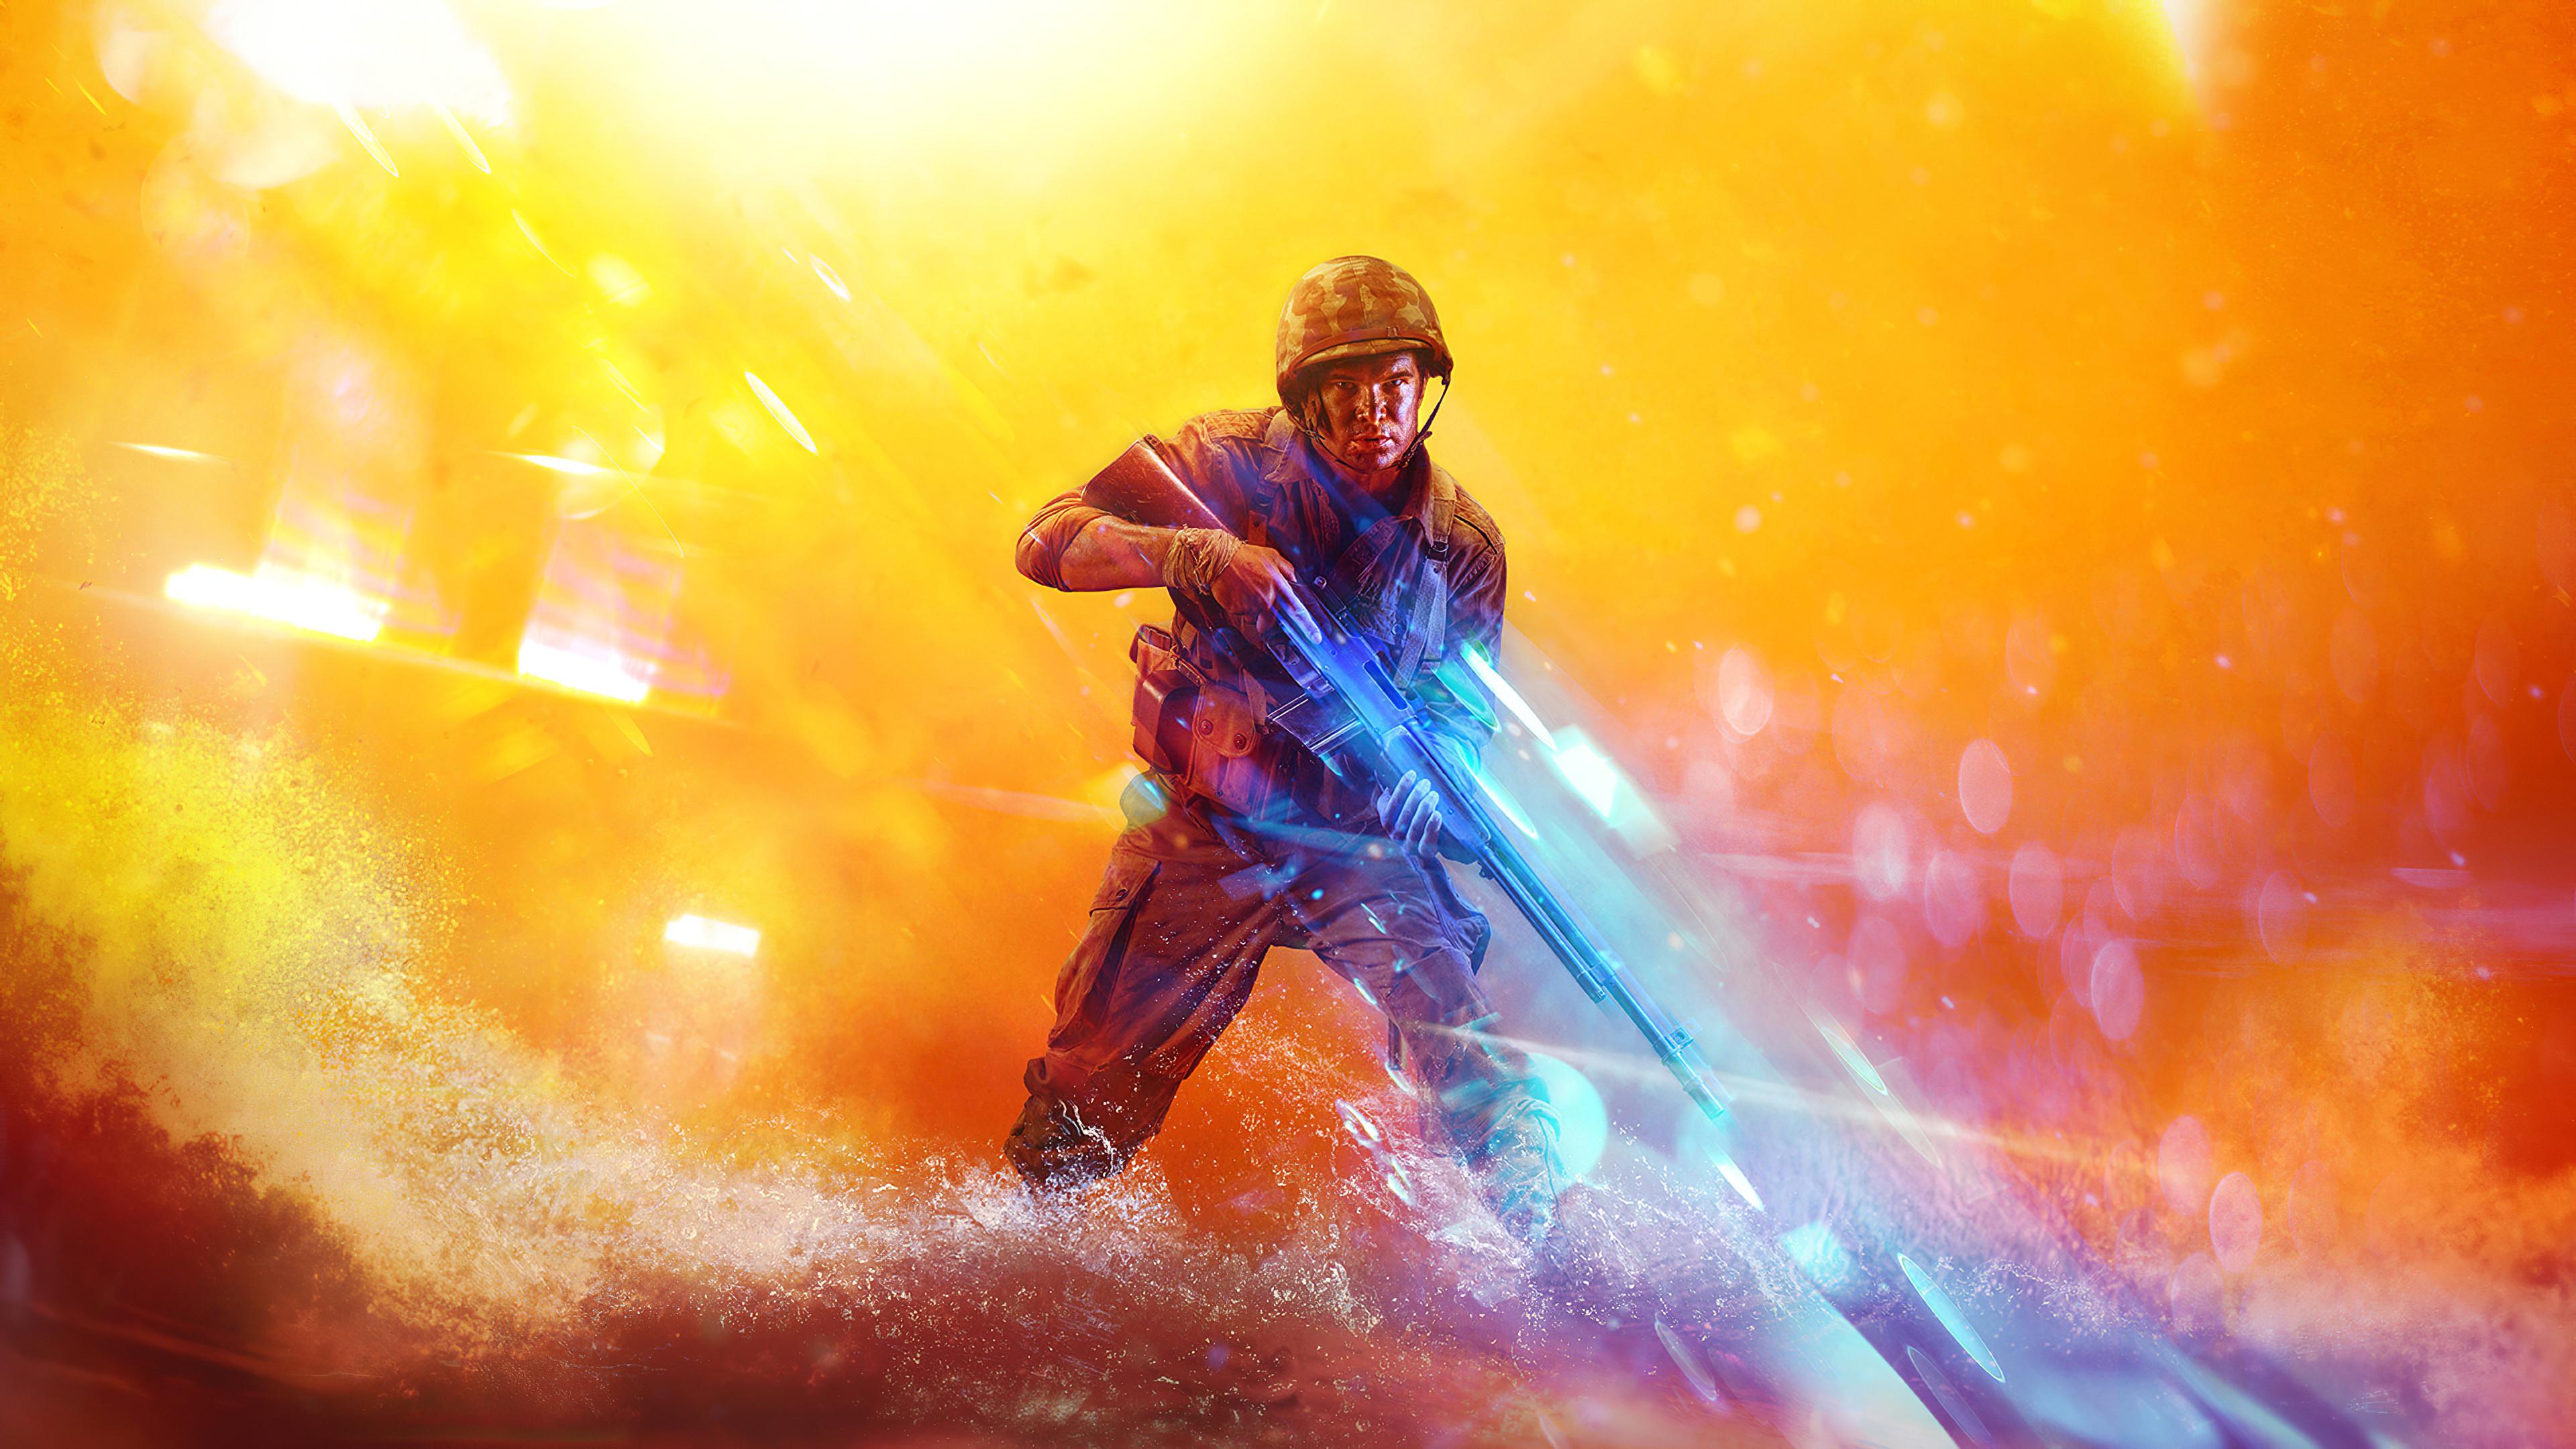 battlefield 5 2019 4k j8 3840x2160 1 - Battlefield 5 - Battlefield wallpaper hd 4k, Battlefield 5 wallpaper, Battlefield 5 4k wallpaper